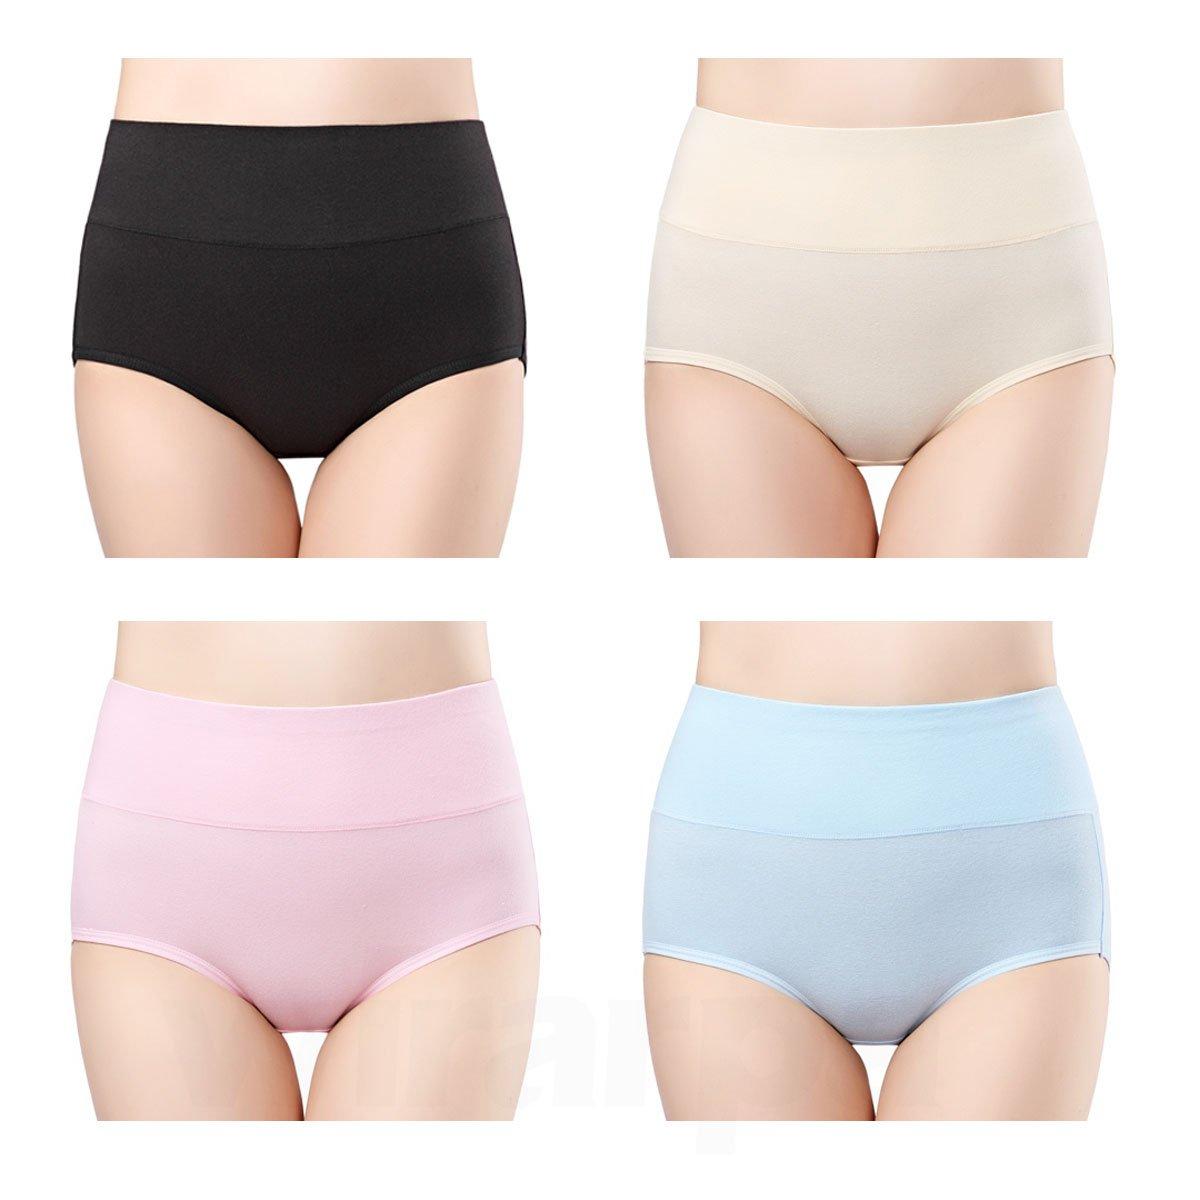 uk availability c8fb8 9811b Am besten bewertete Produkte in der Kategorie Panties ...